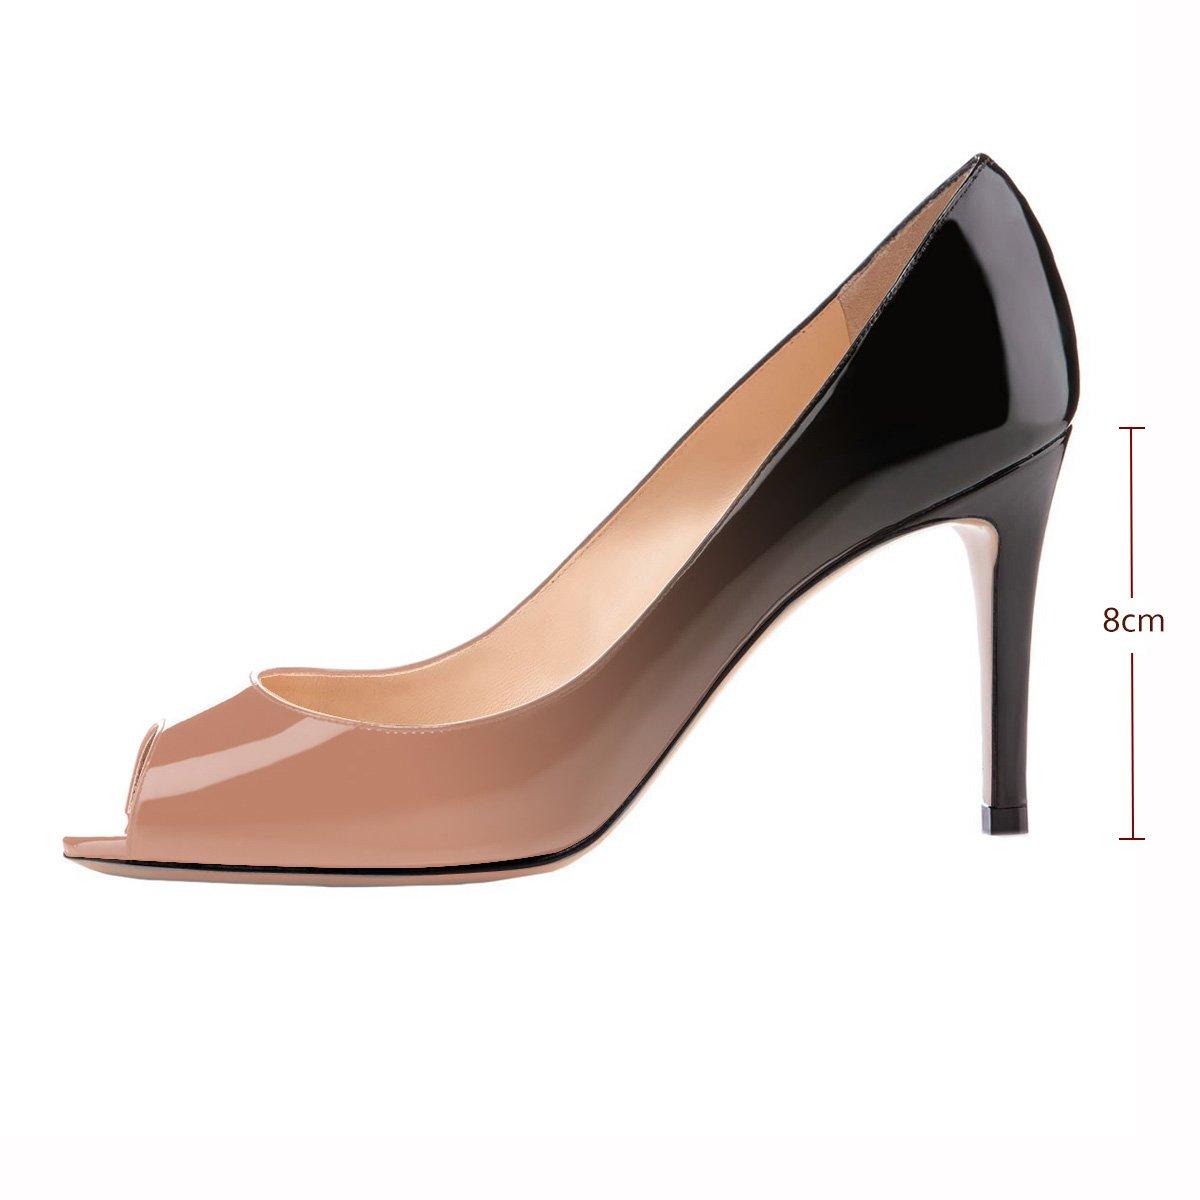 Eldof Women Peep Toe Wedding Pumps Mid-Heel Pumps Formal Wedding Toe Bridal Classic Heel Open Toe Stiletto B07F8WFVYH 12 B(M) US|Beige-black cd28d9